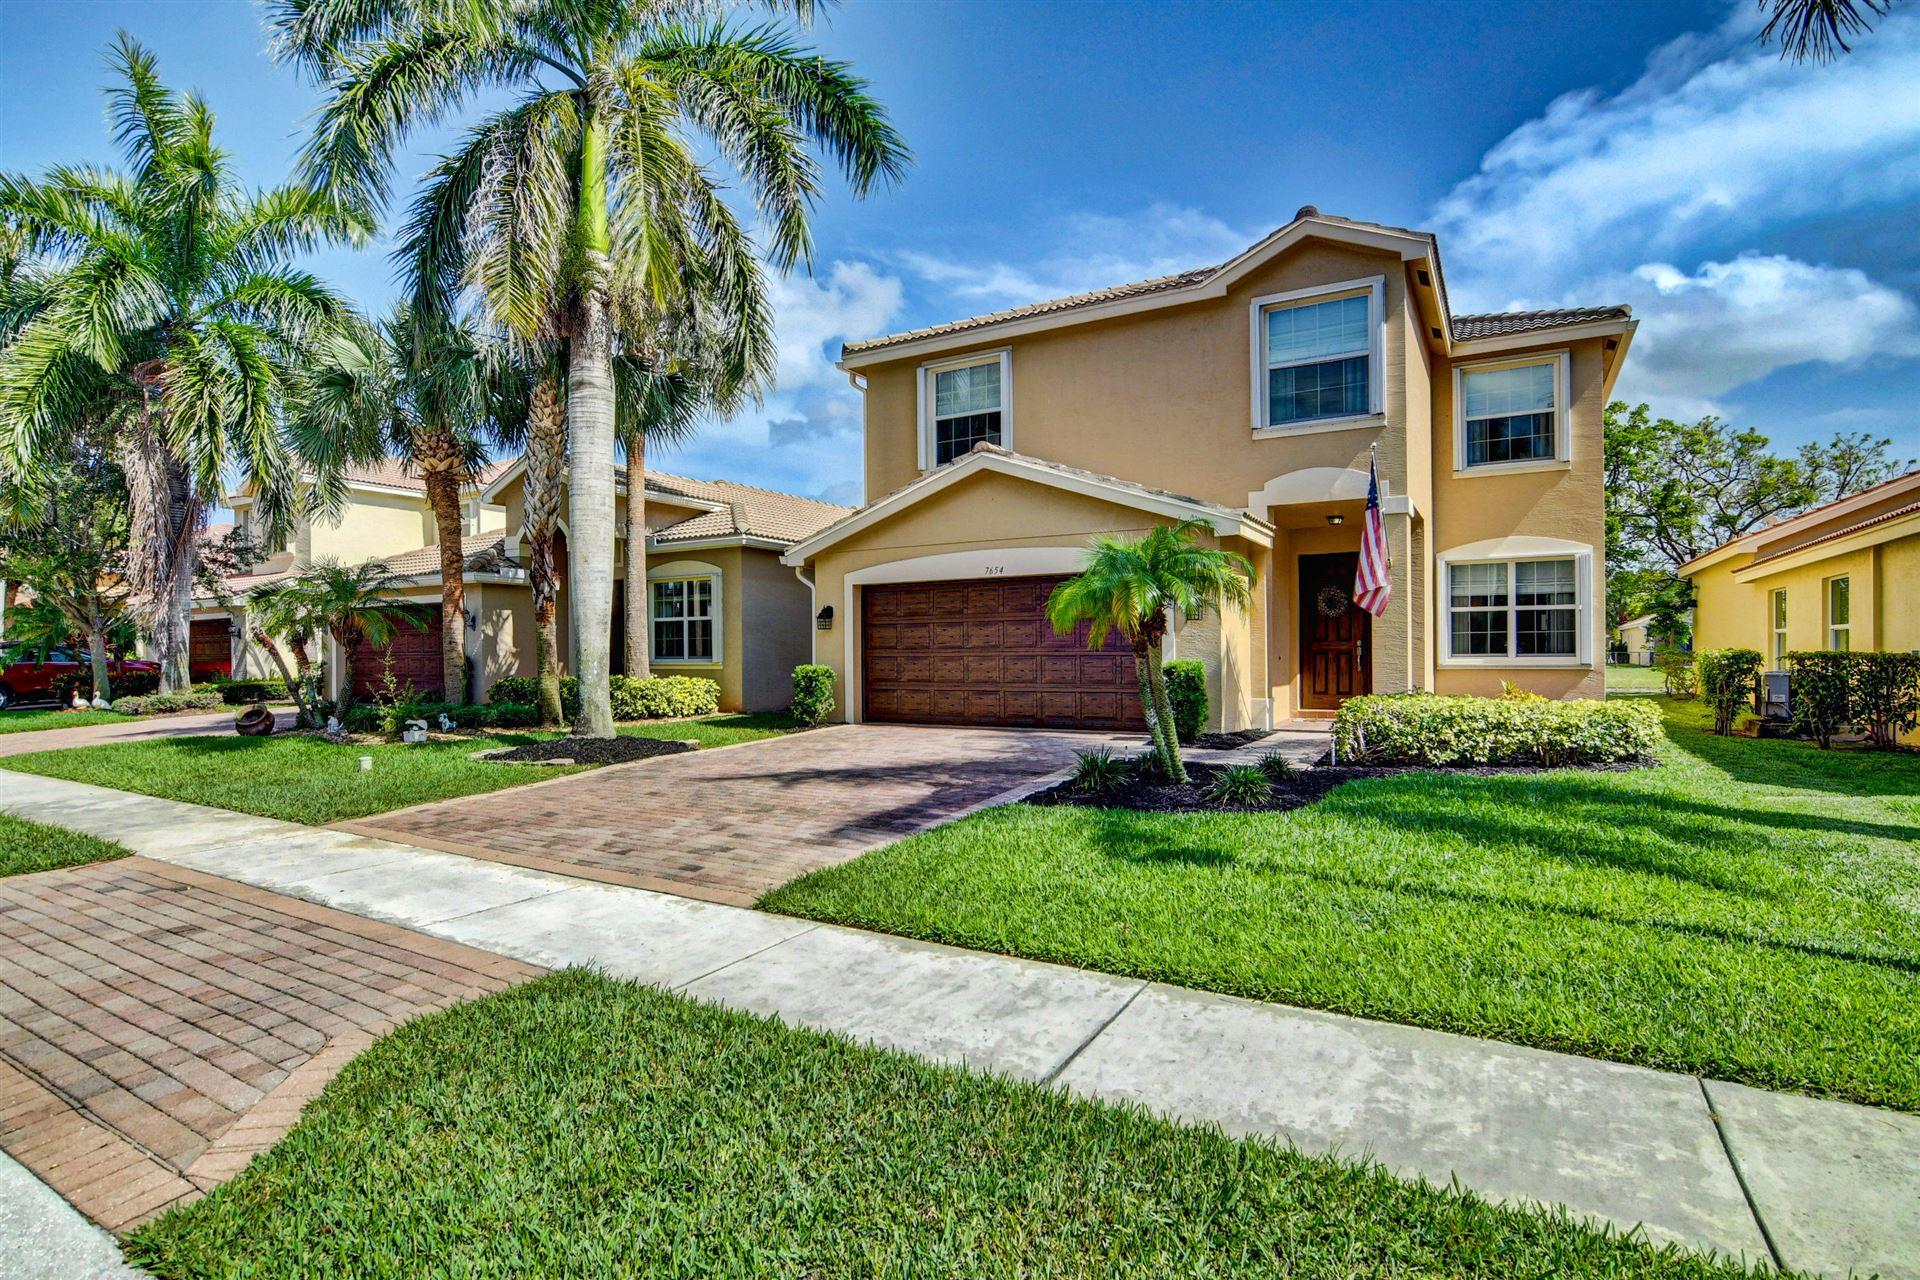 7654 Jewelwood Drive, Boynton Beach, FL 33437 - #: RX-10723480